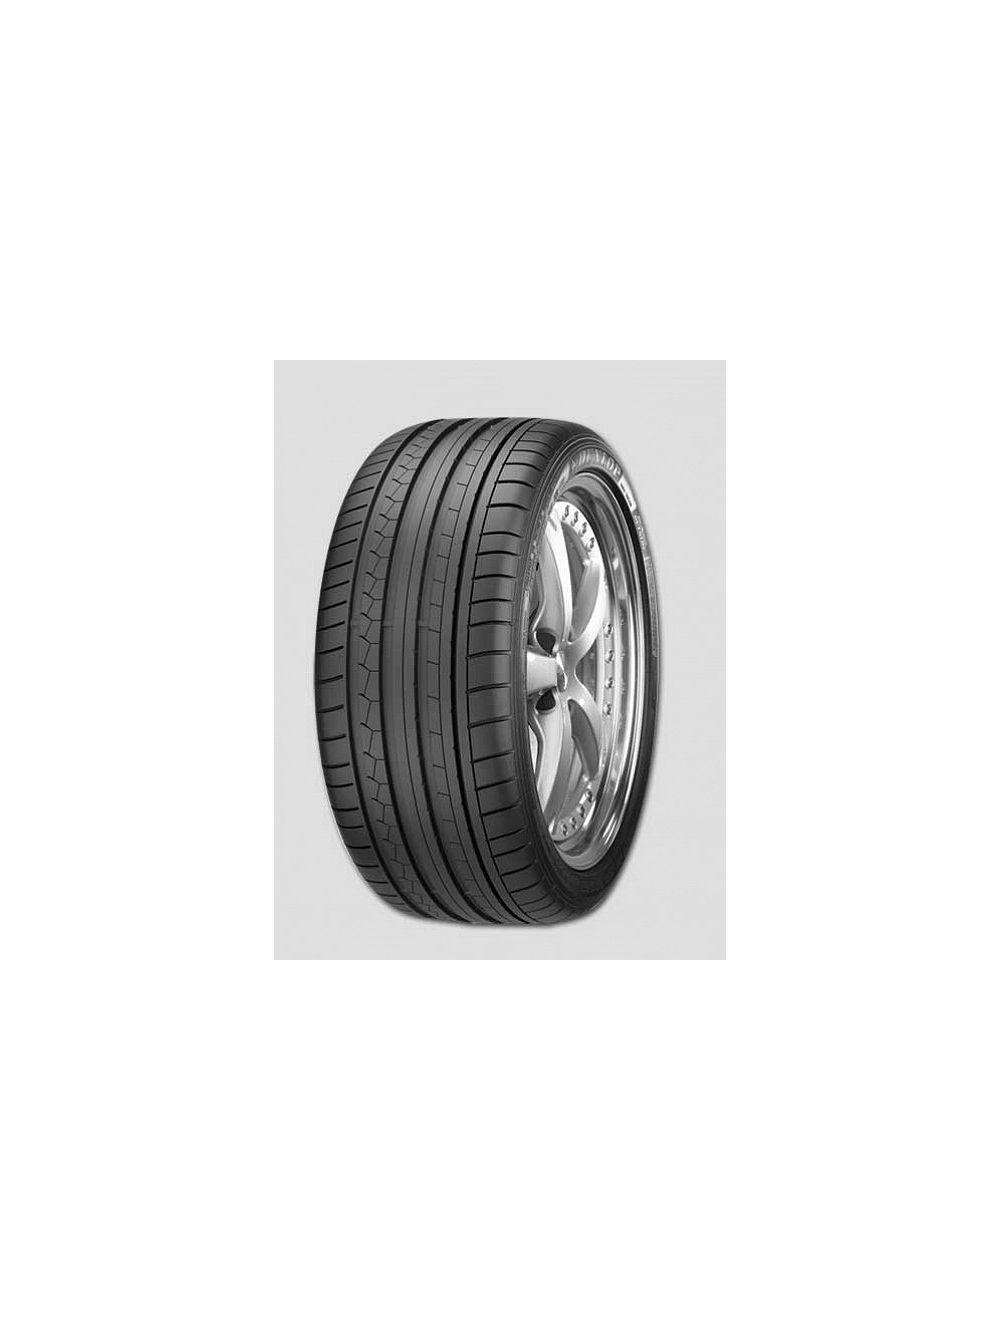 Dunlop 245/50R18 Y SP Sport Maxx GT MFS ROF * Nyári gumi